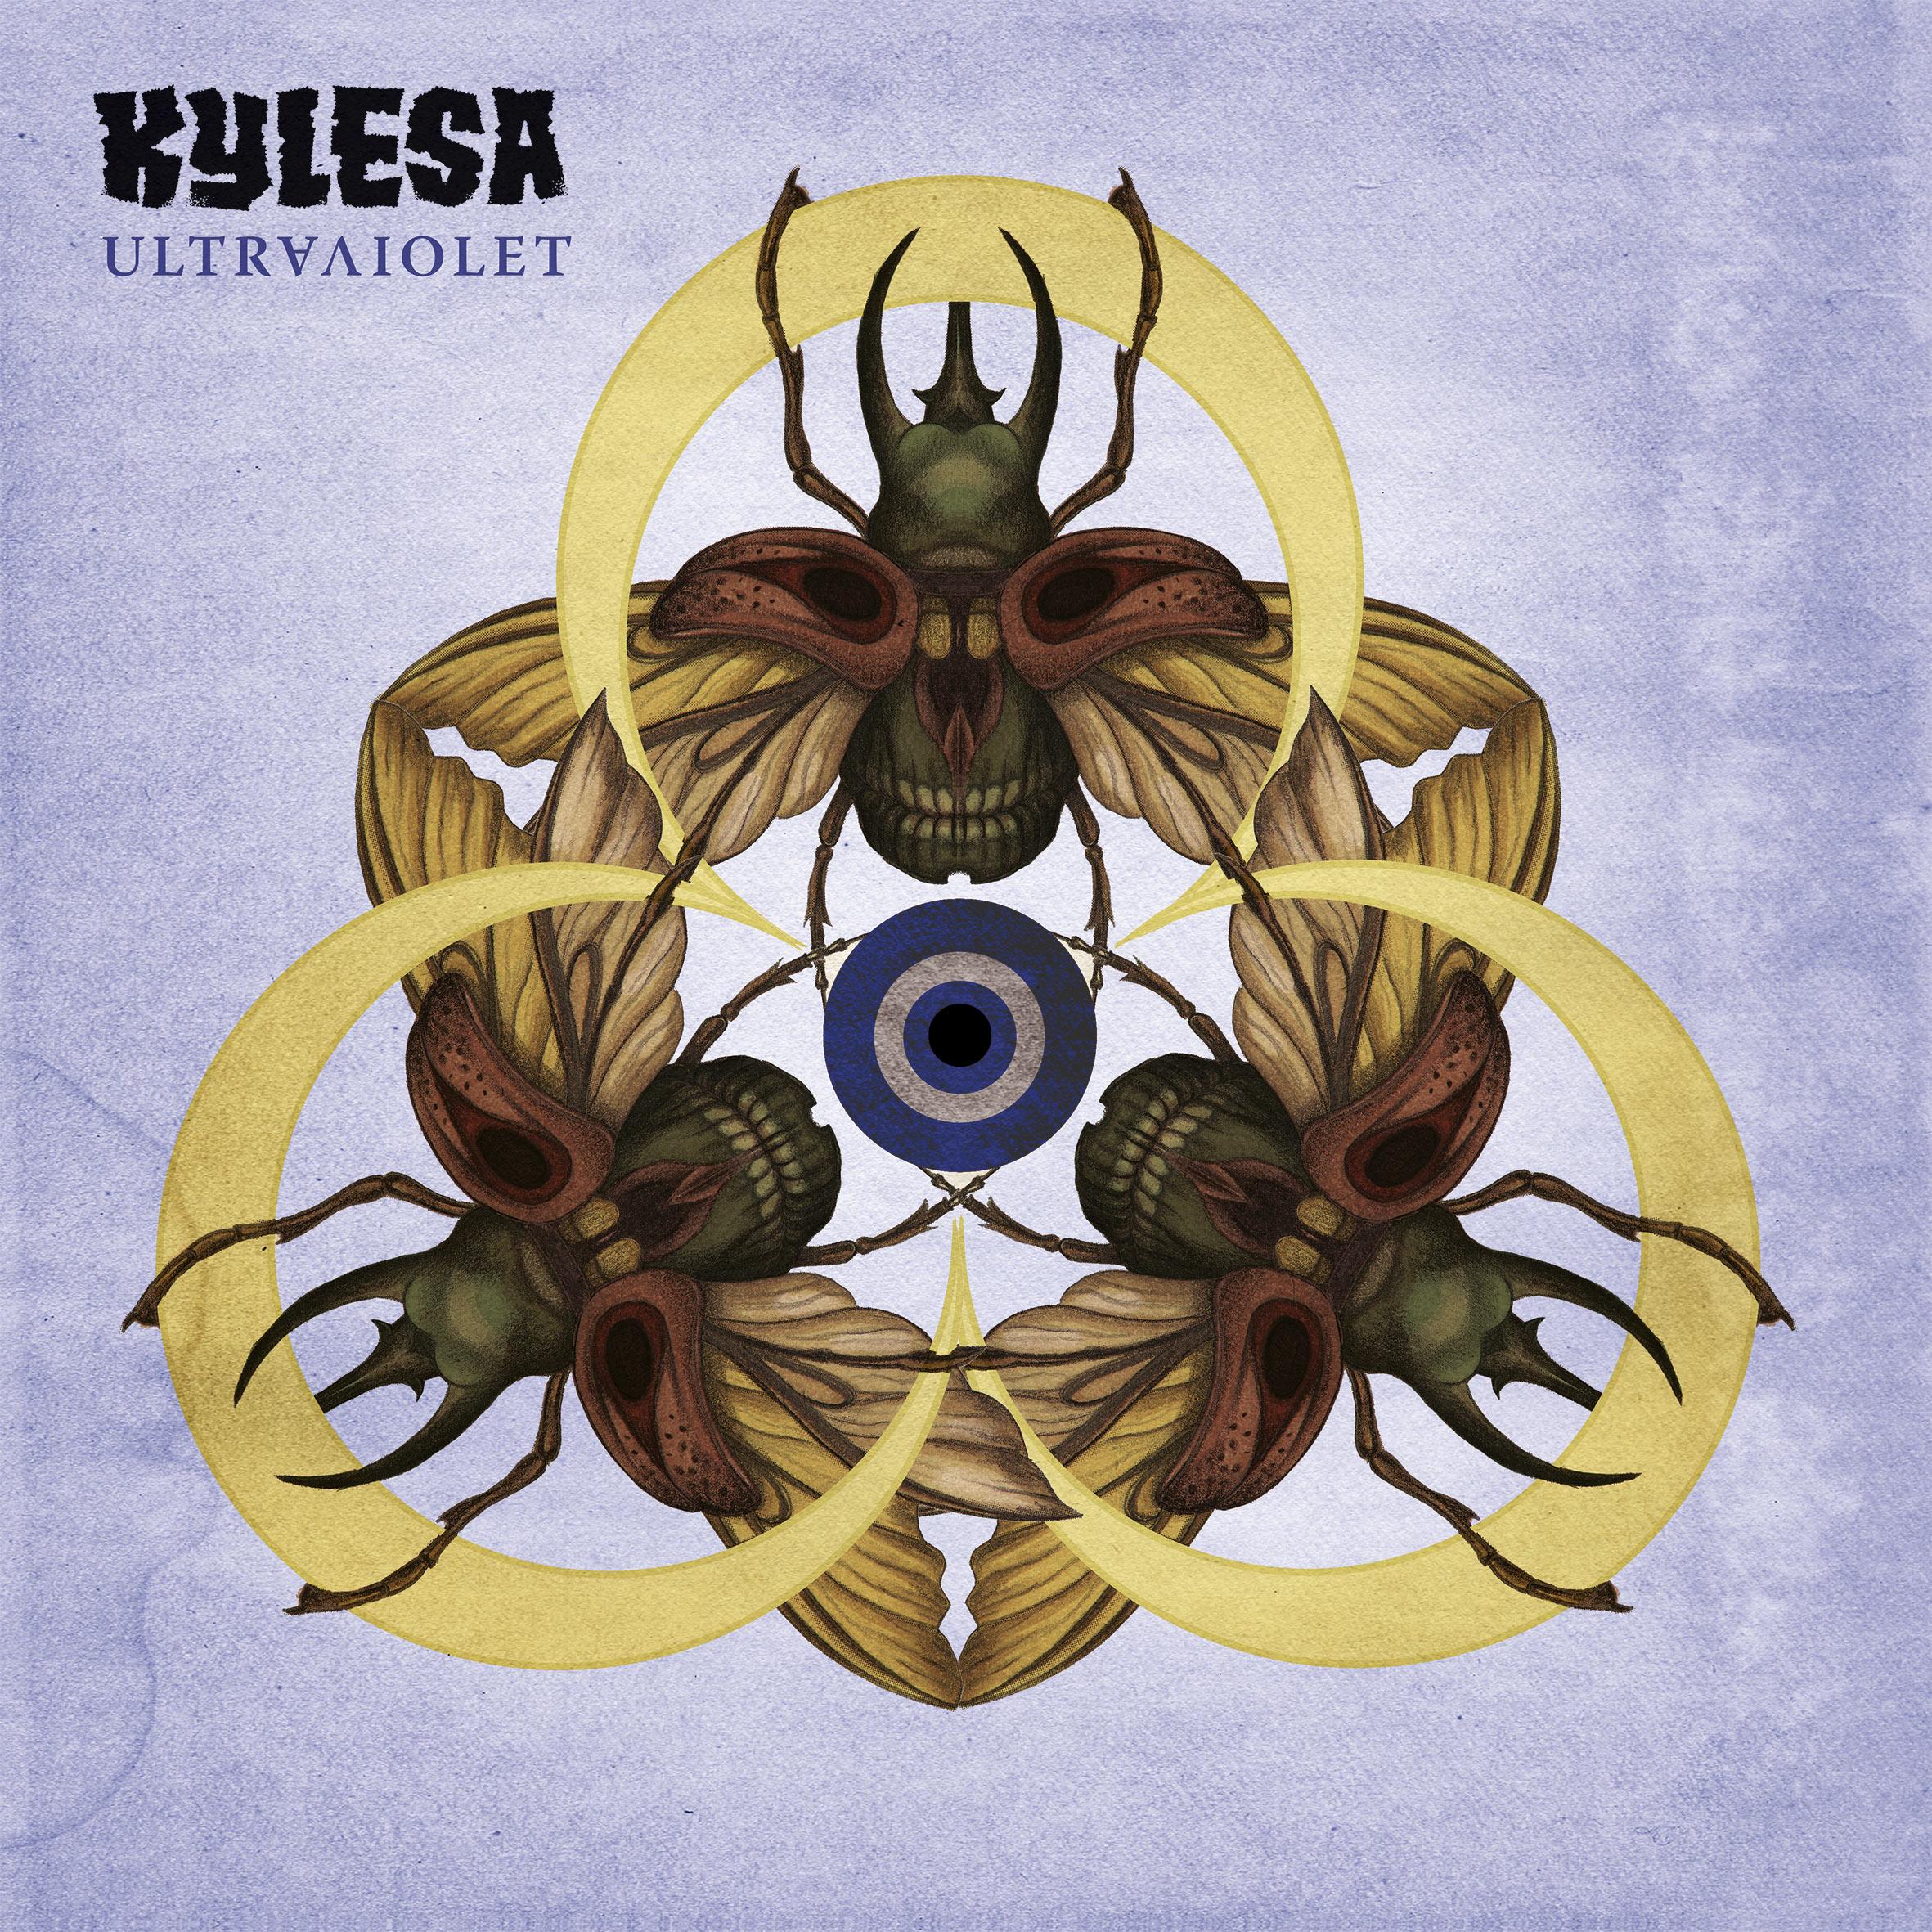 The Peace Which Passeth Understanding: Kylesa's Ultraviolet